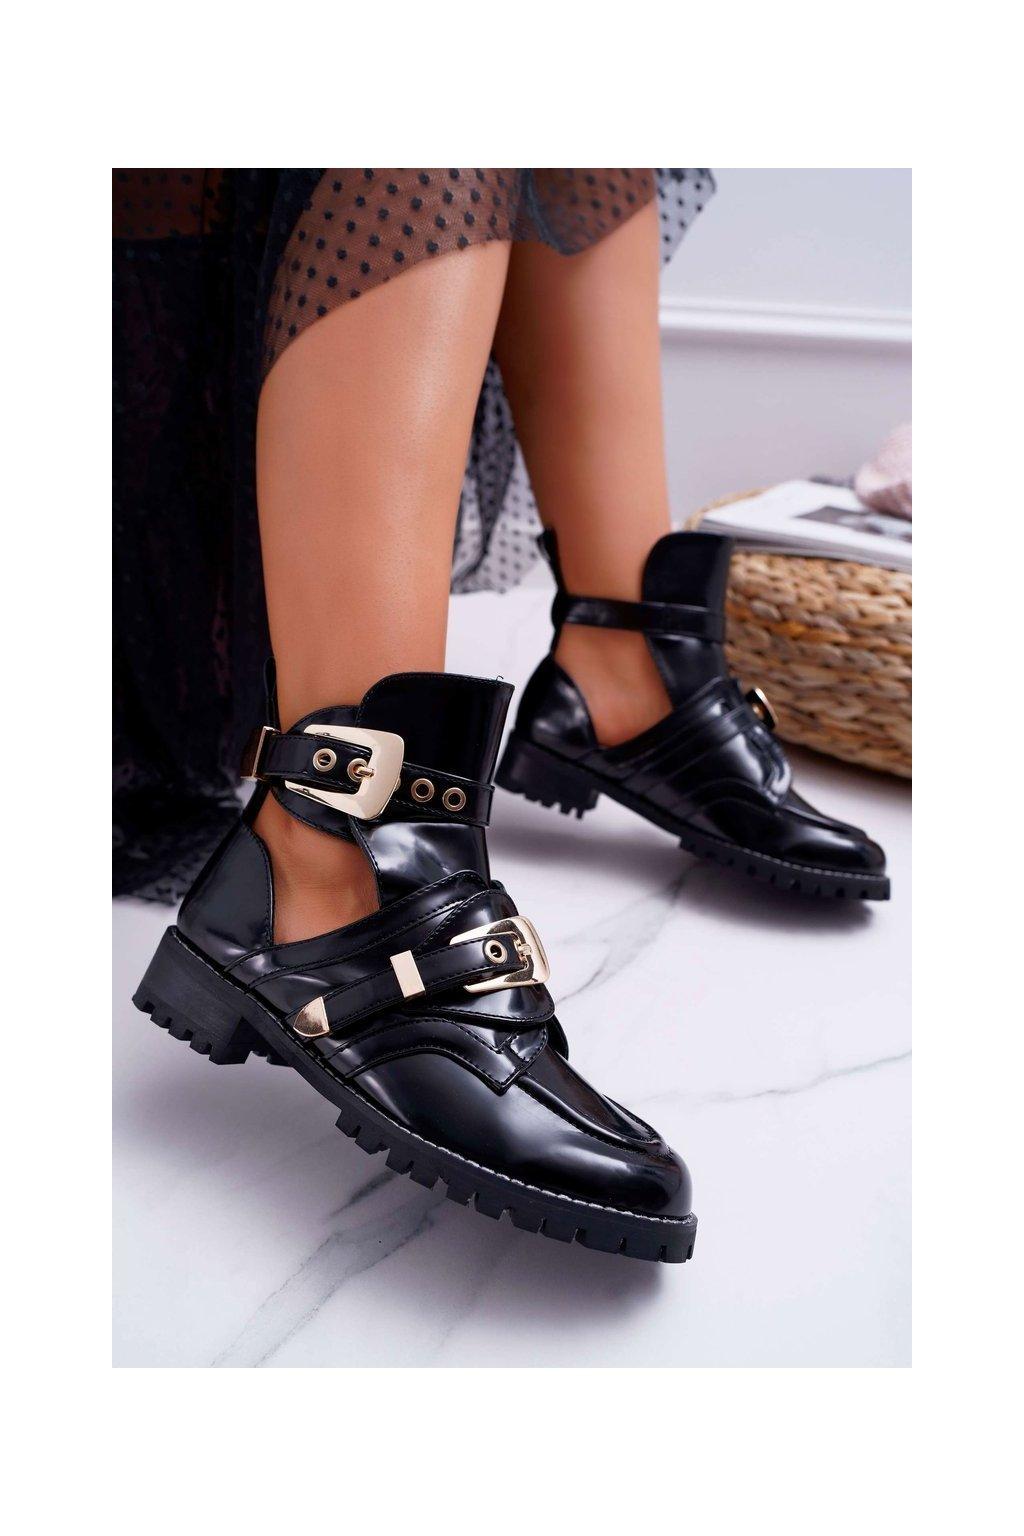 Členkové topánky na podpätku farba čierna NJSK XW37266 BLK PAT PU